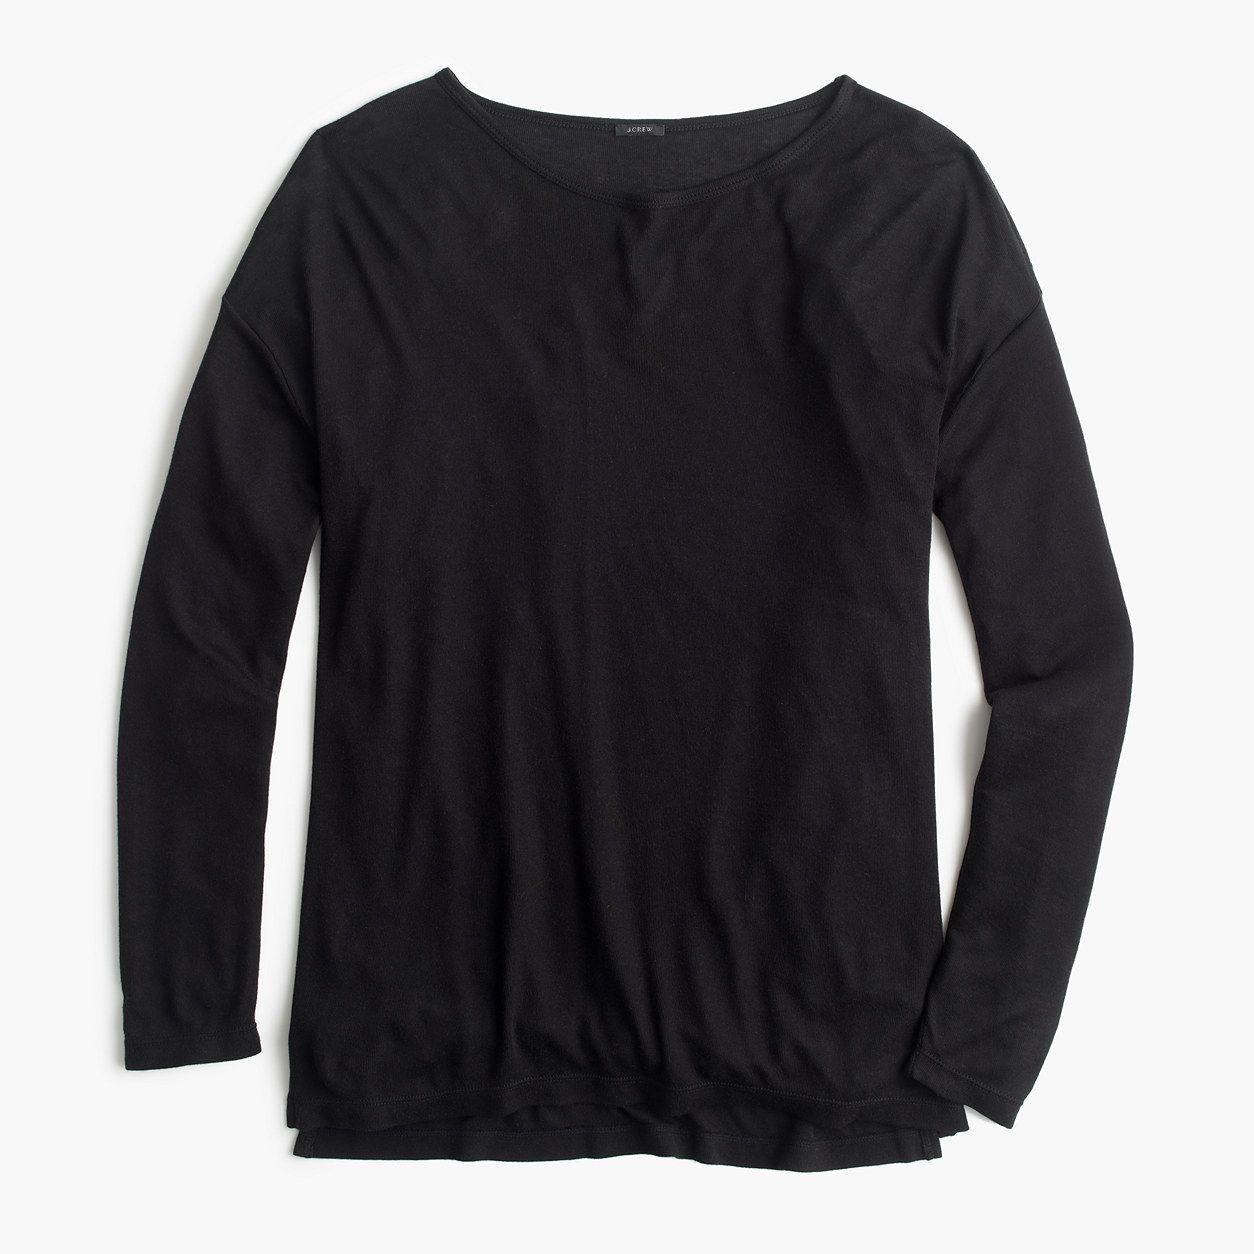 J.Crew Womens 10 Percent Deck T-Shirt (Size